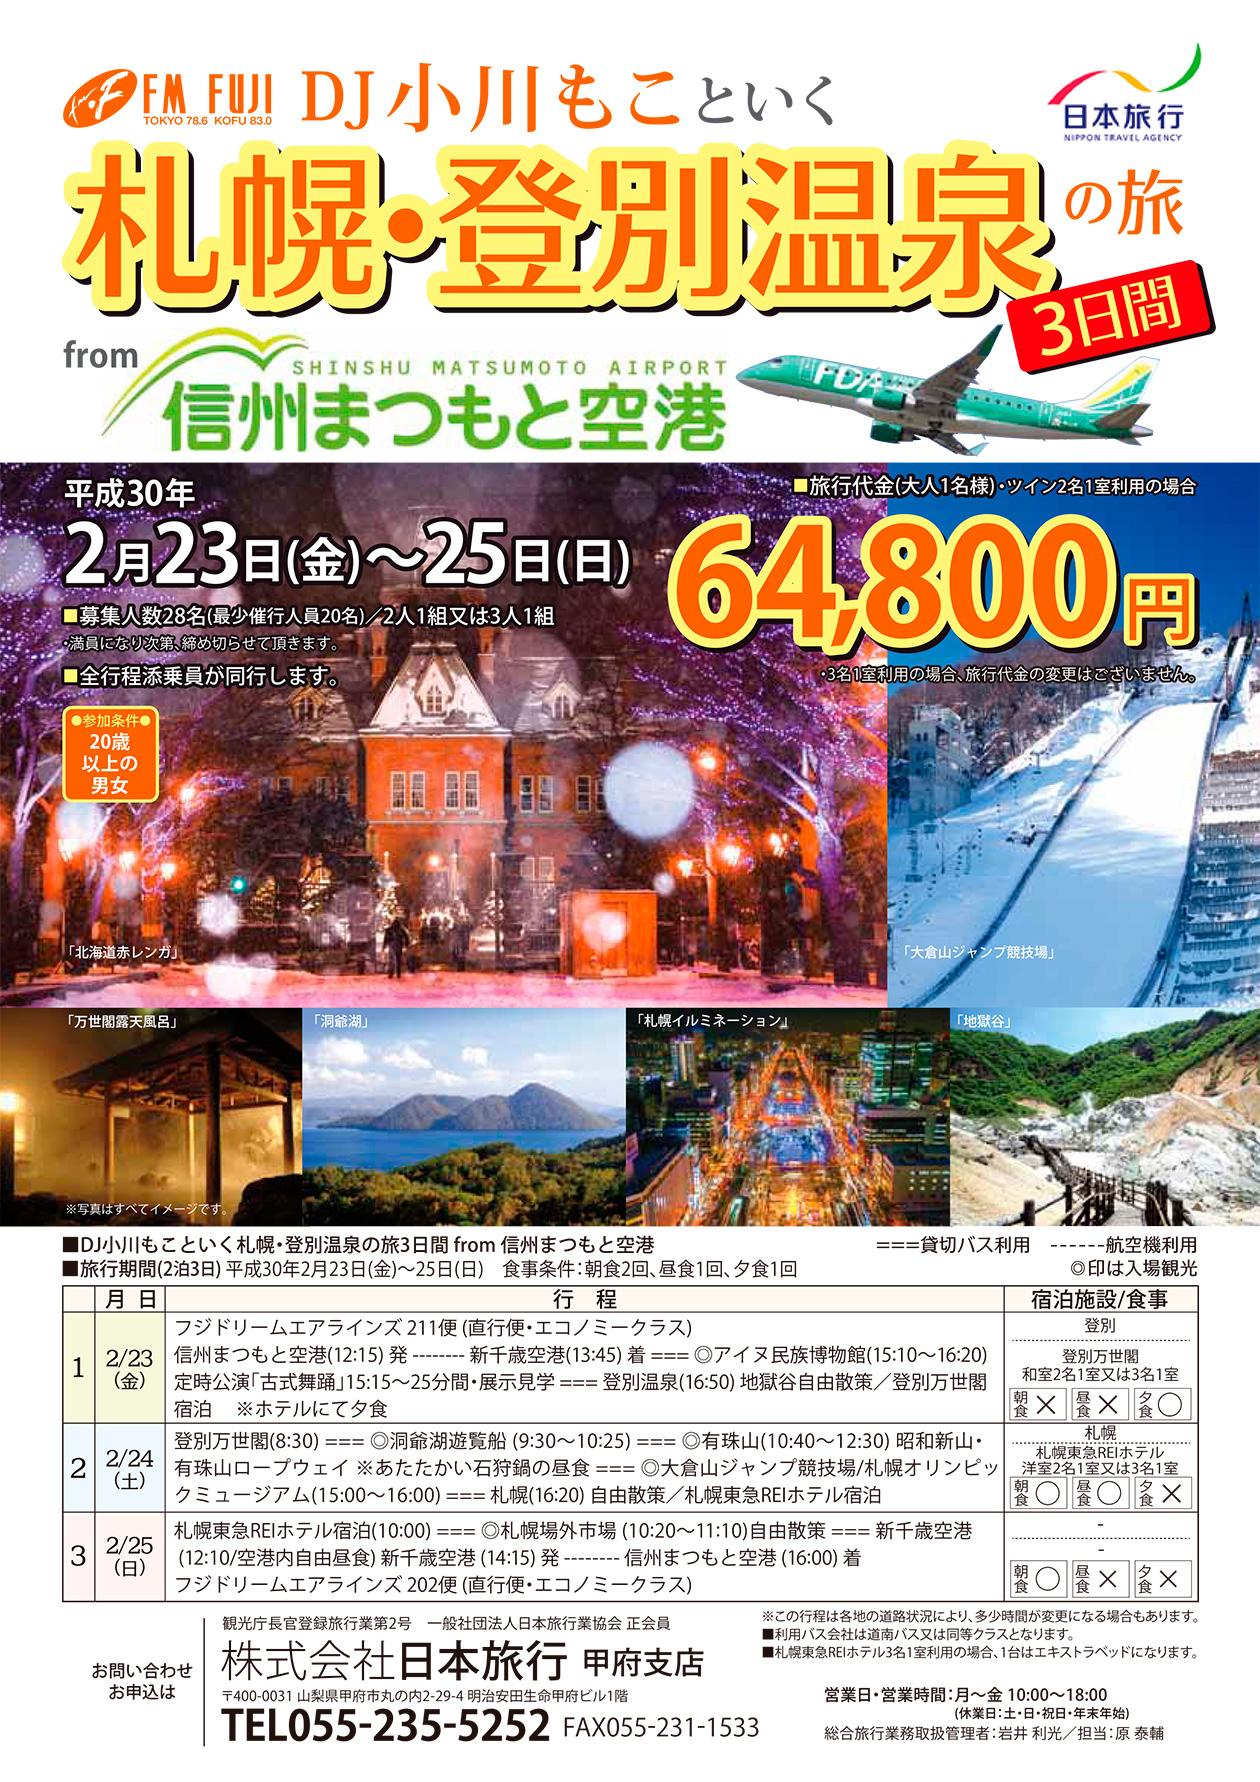 DJ小川もこといく札幌・登別温泉の旅3日間  from 信州まつもと空港